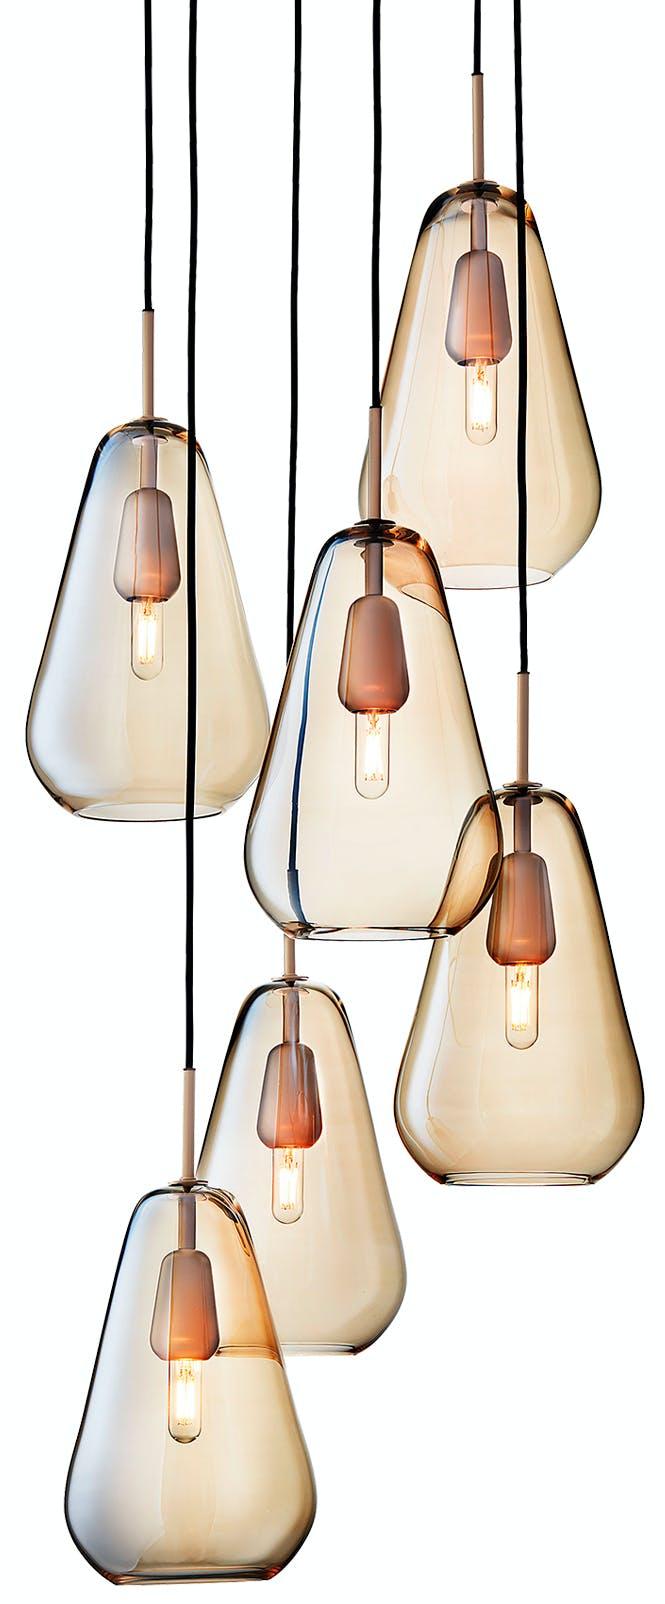 nuura anoli 6 chandelier thumb haute living